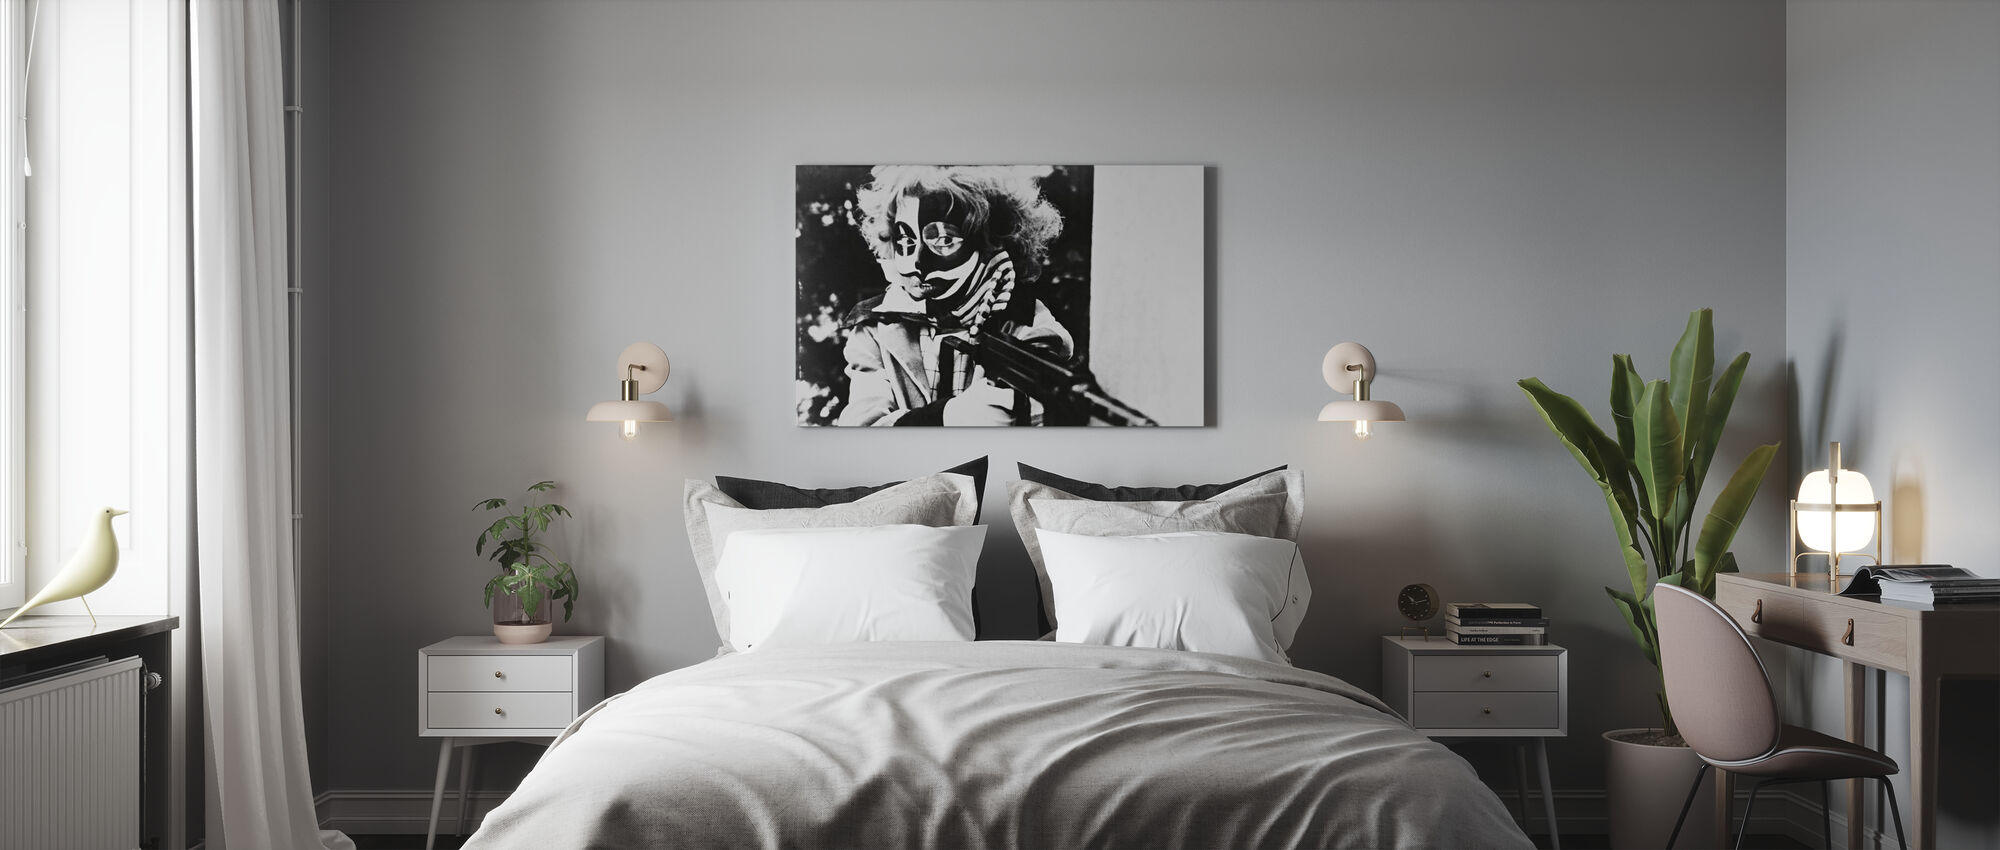 Third Generation - Hanna Schygulla - Canvas print - Bedroom